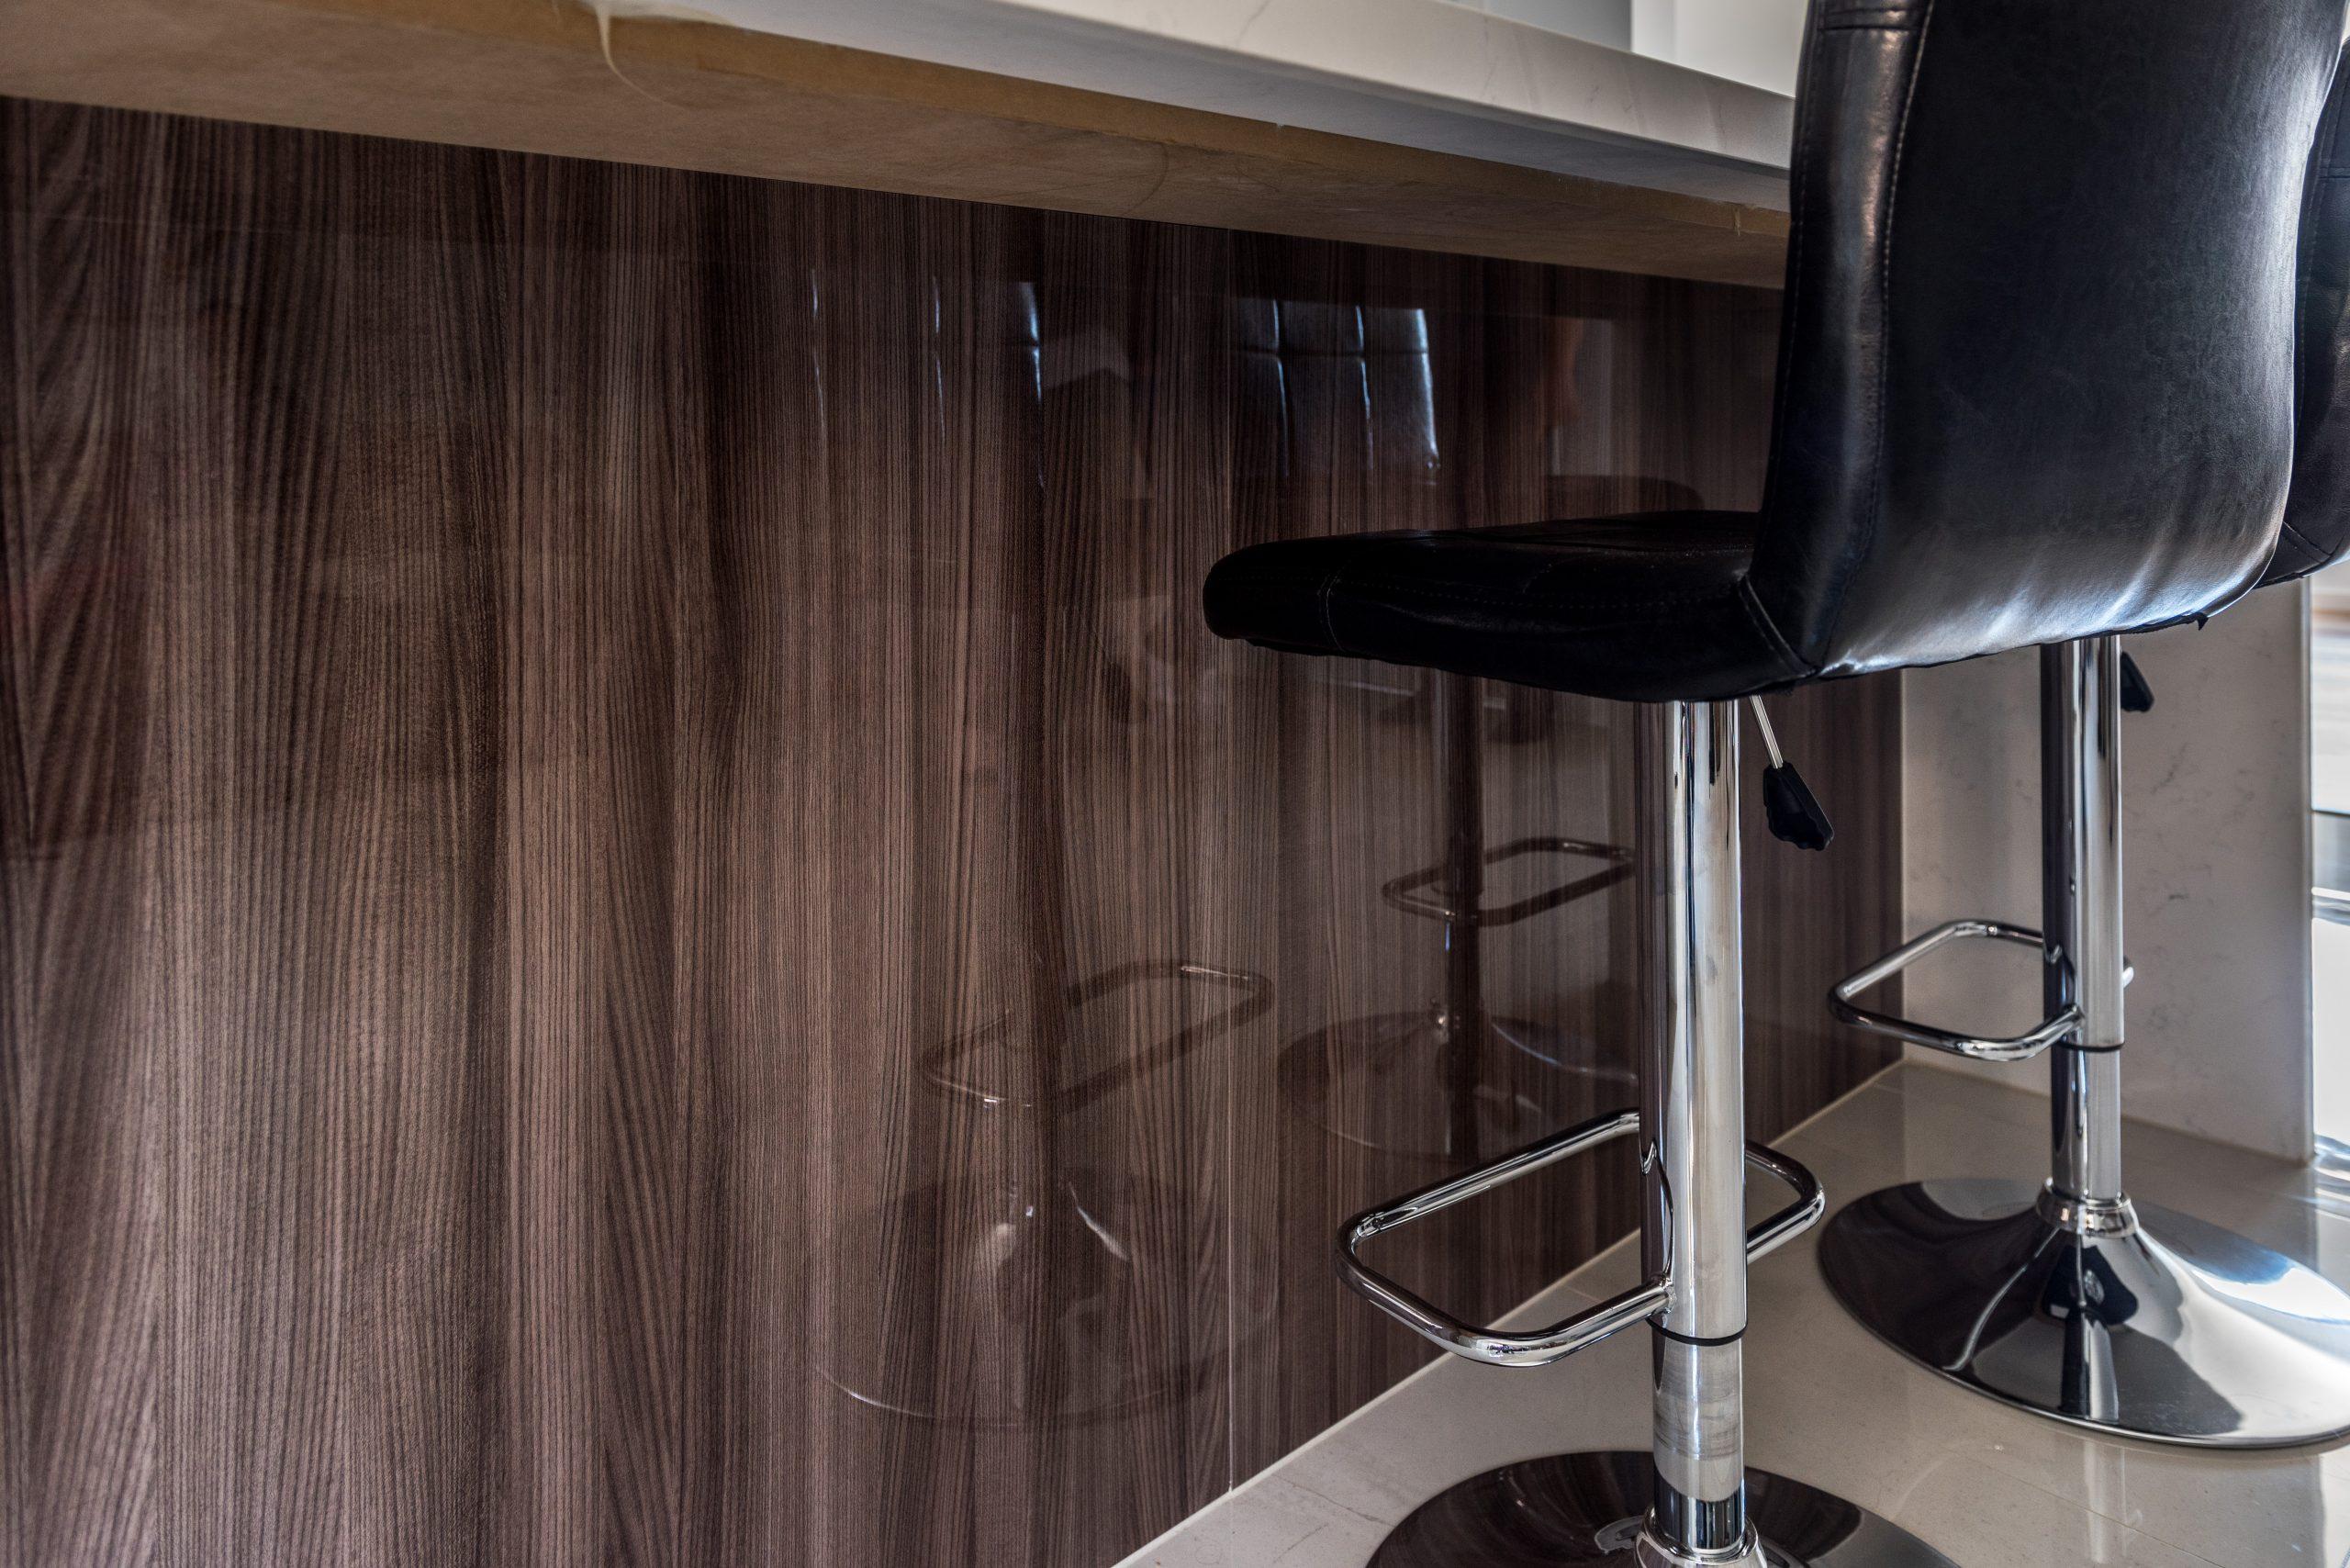 nx decor wood look laminate